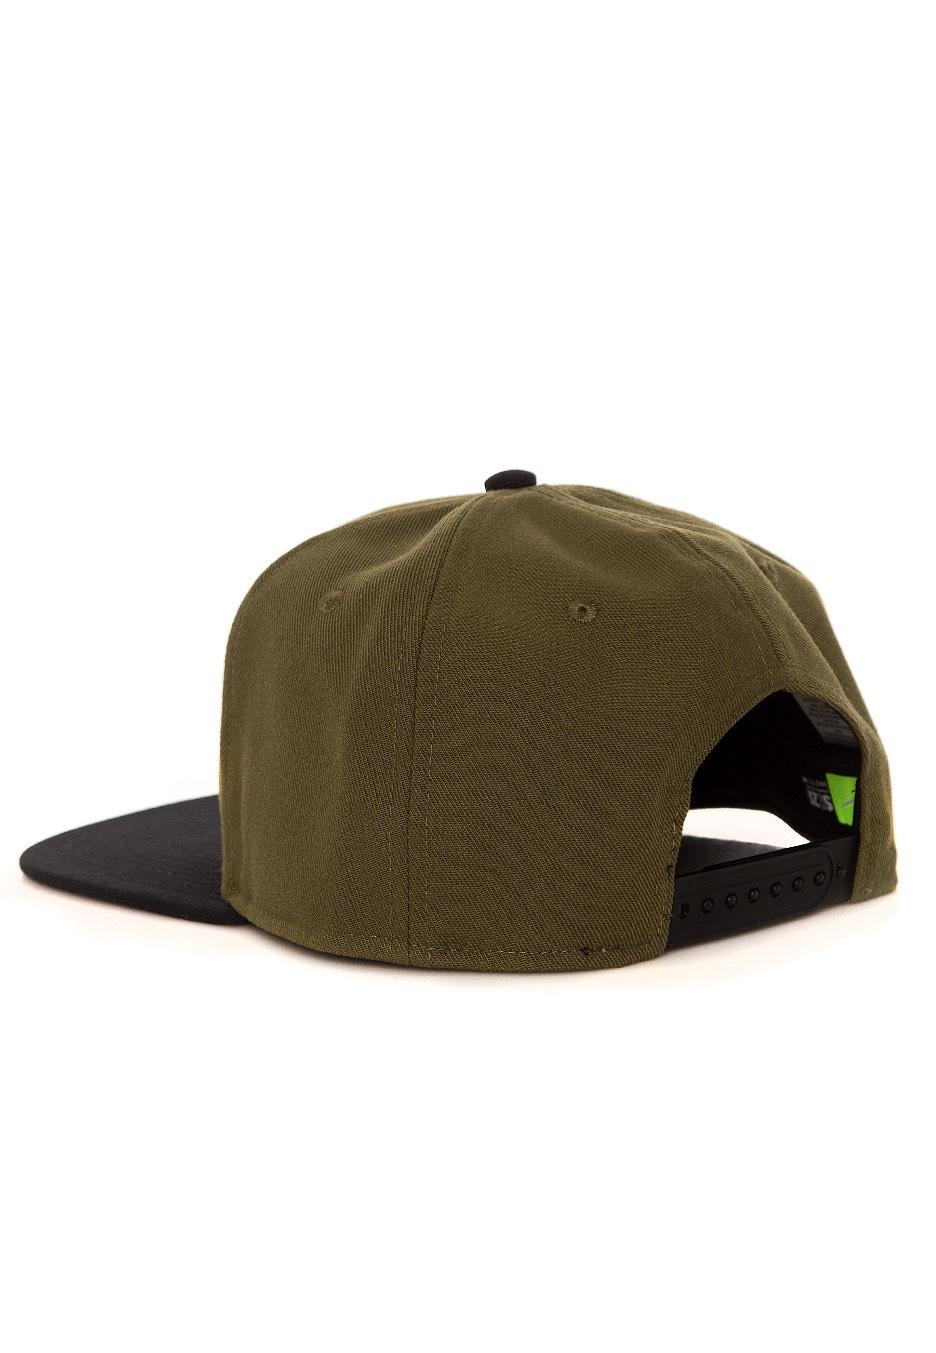 ... Nike - Pro Swoosh Classic Olive Canvas Black Yellow Ochre - Cap ... 54a9ddd7886